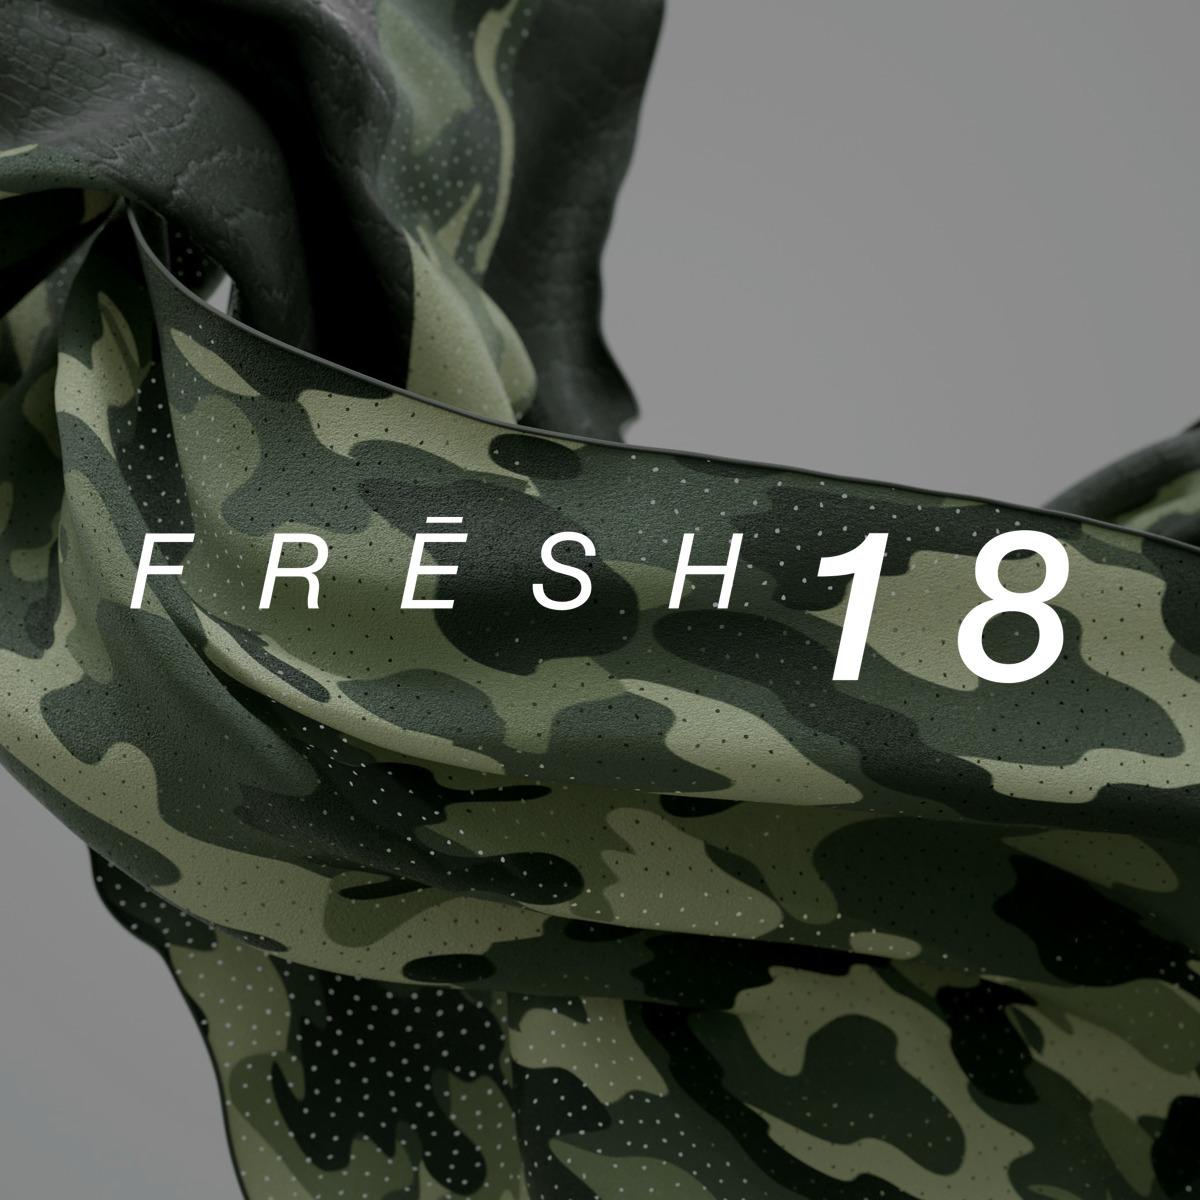 Frēsh 18